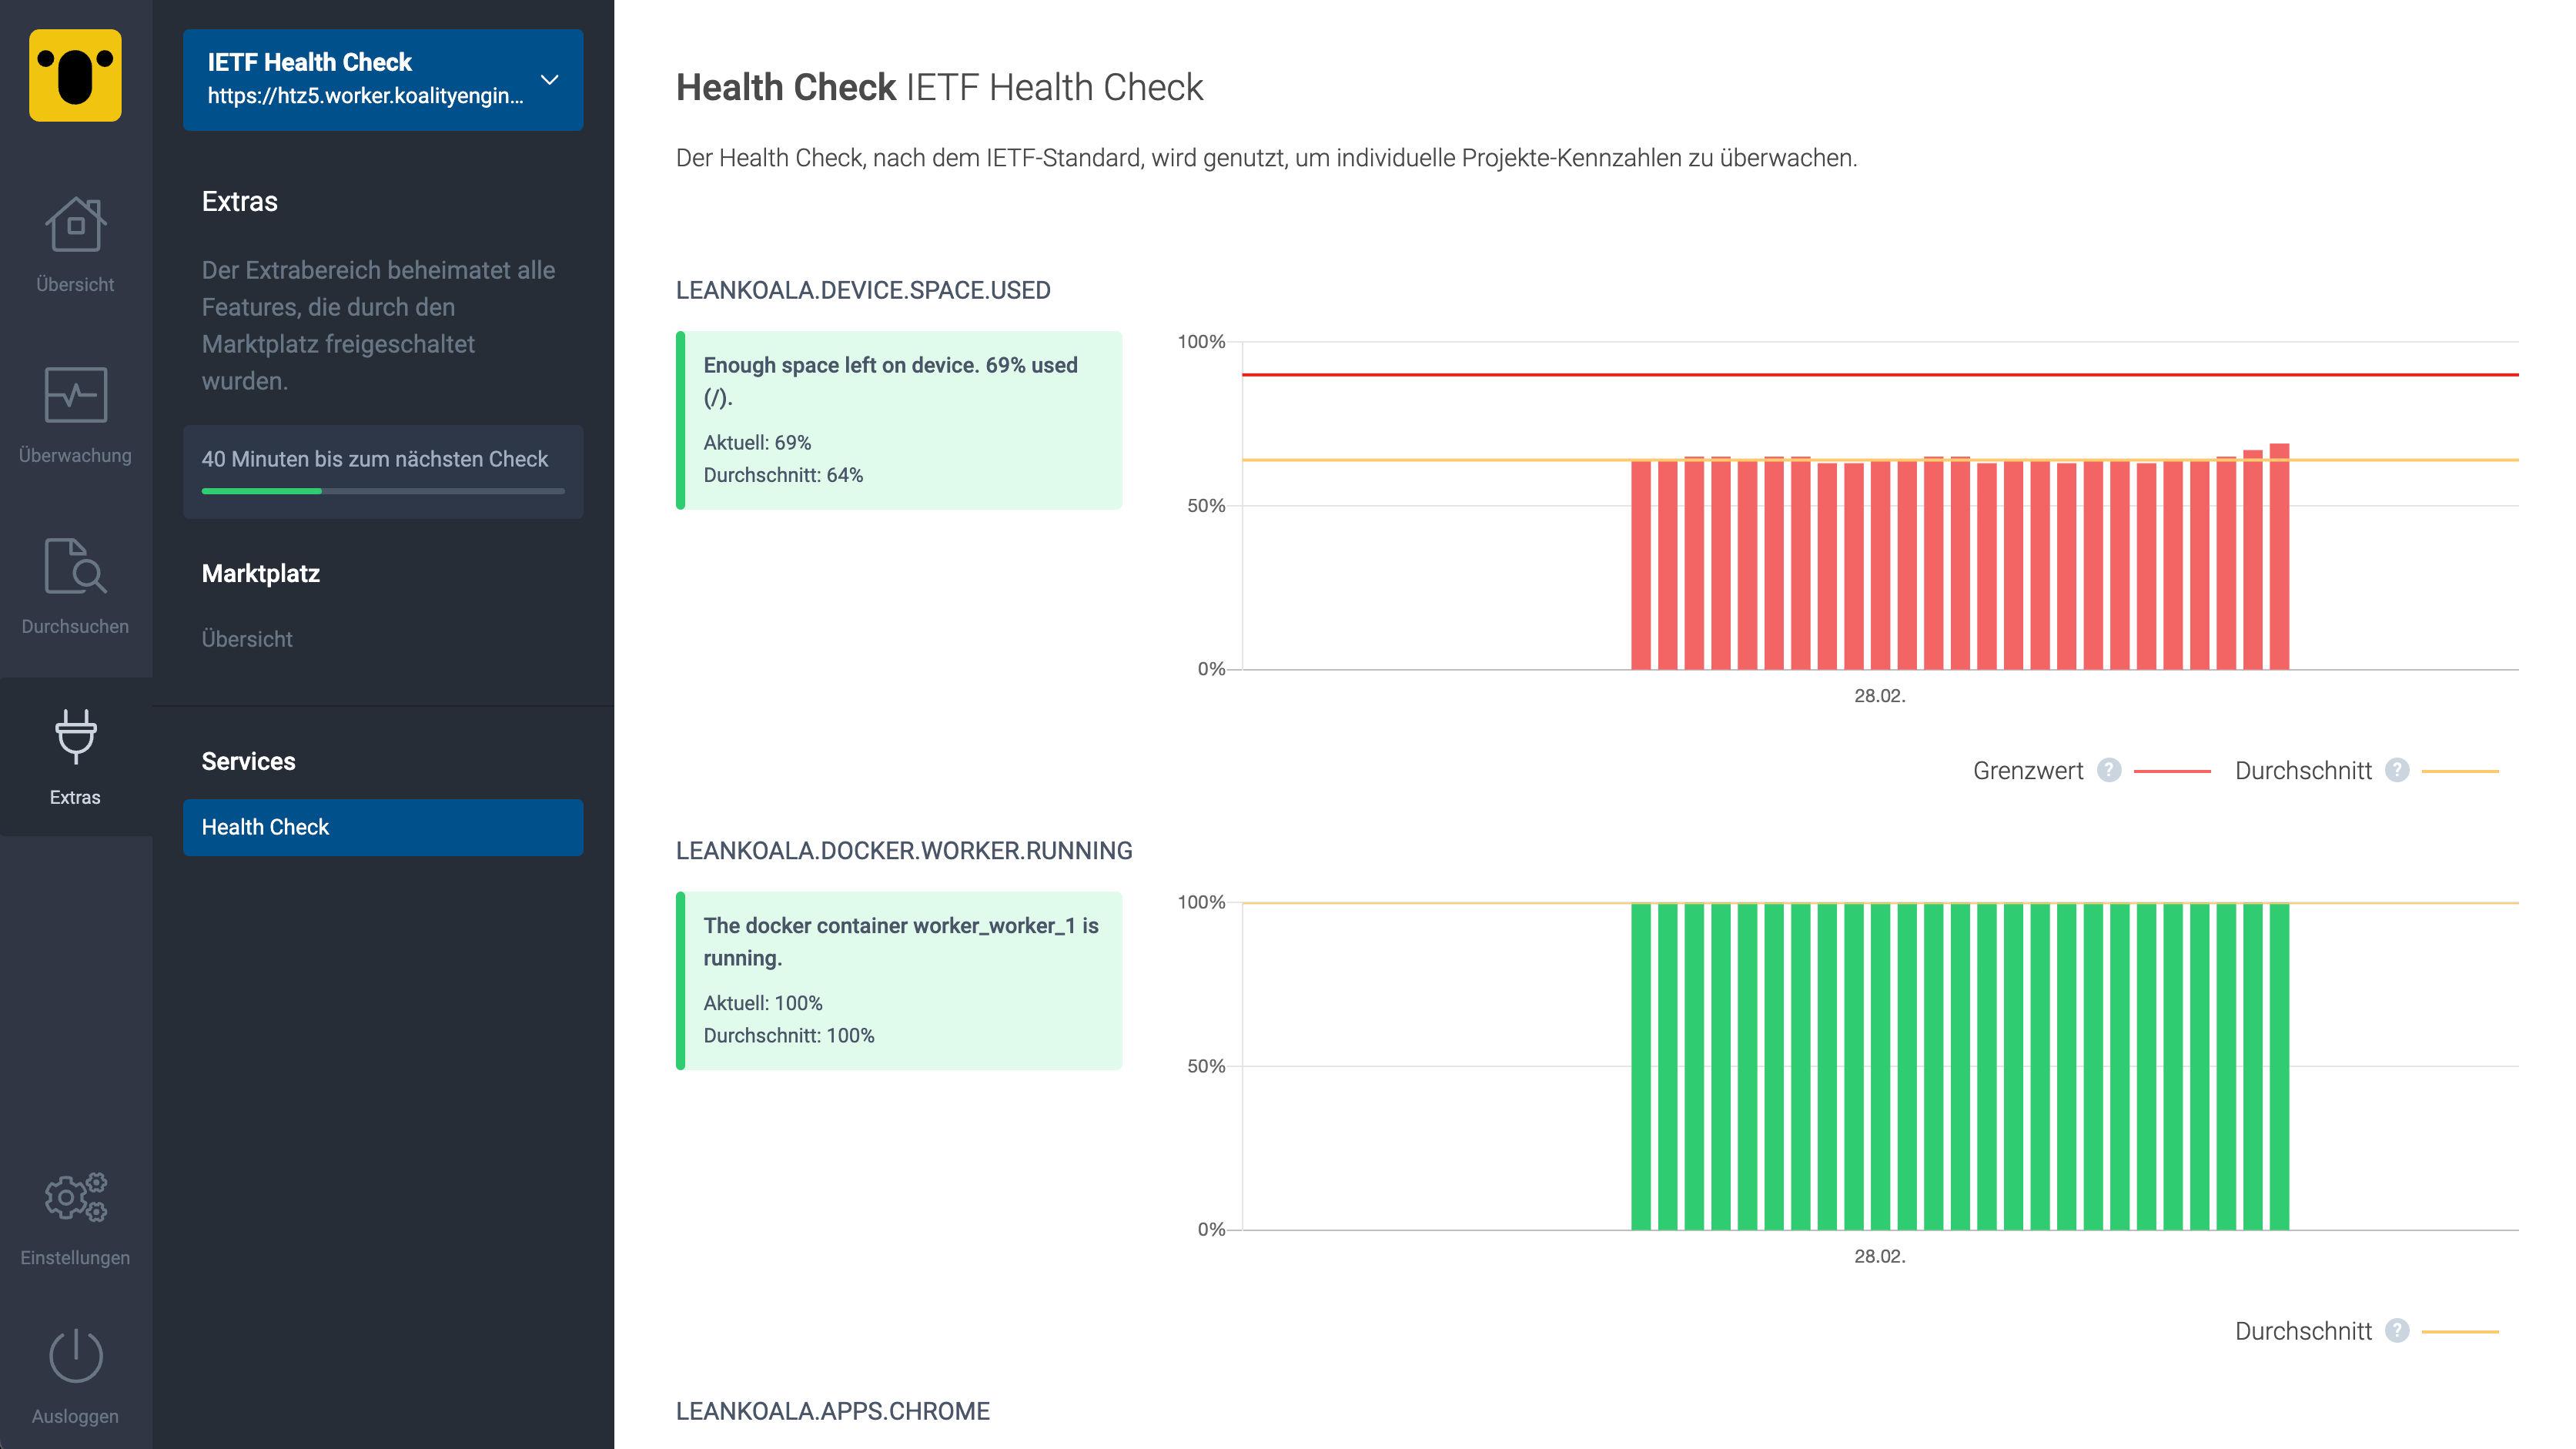 IETF Health Check Preview